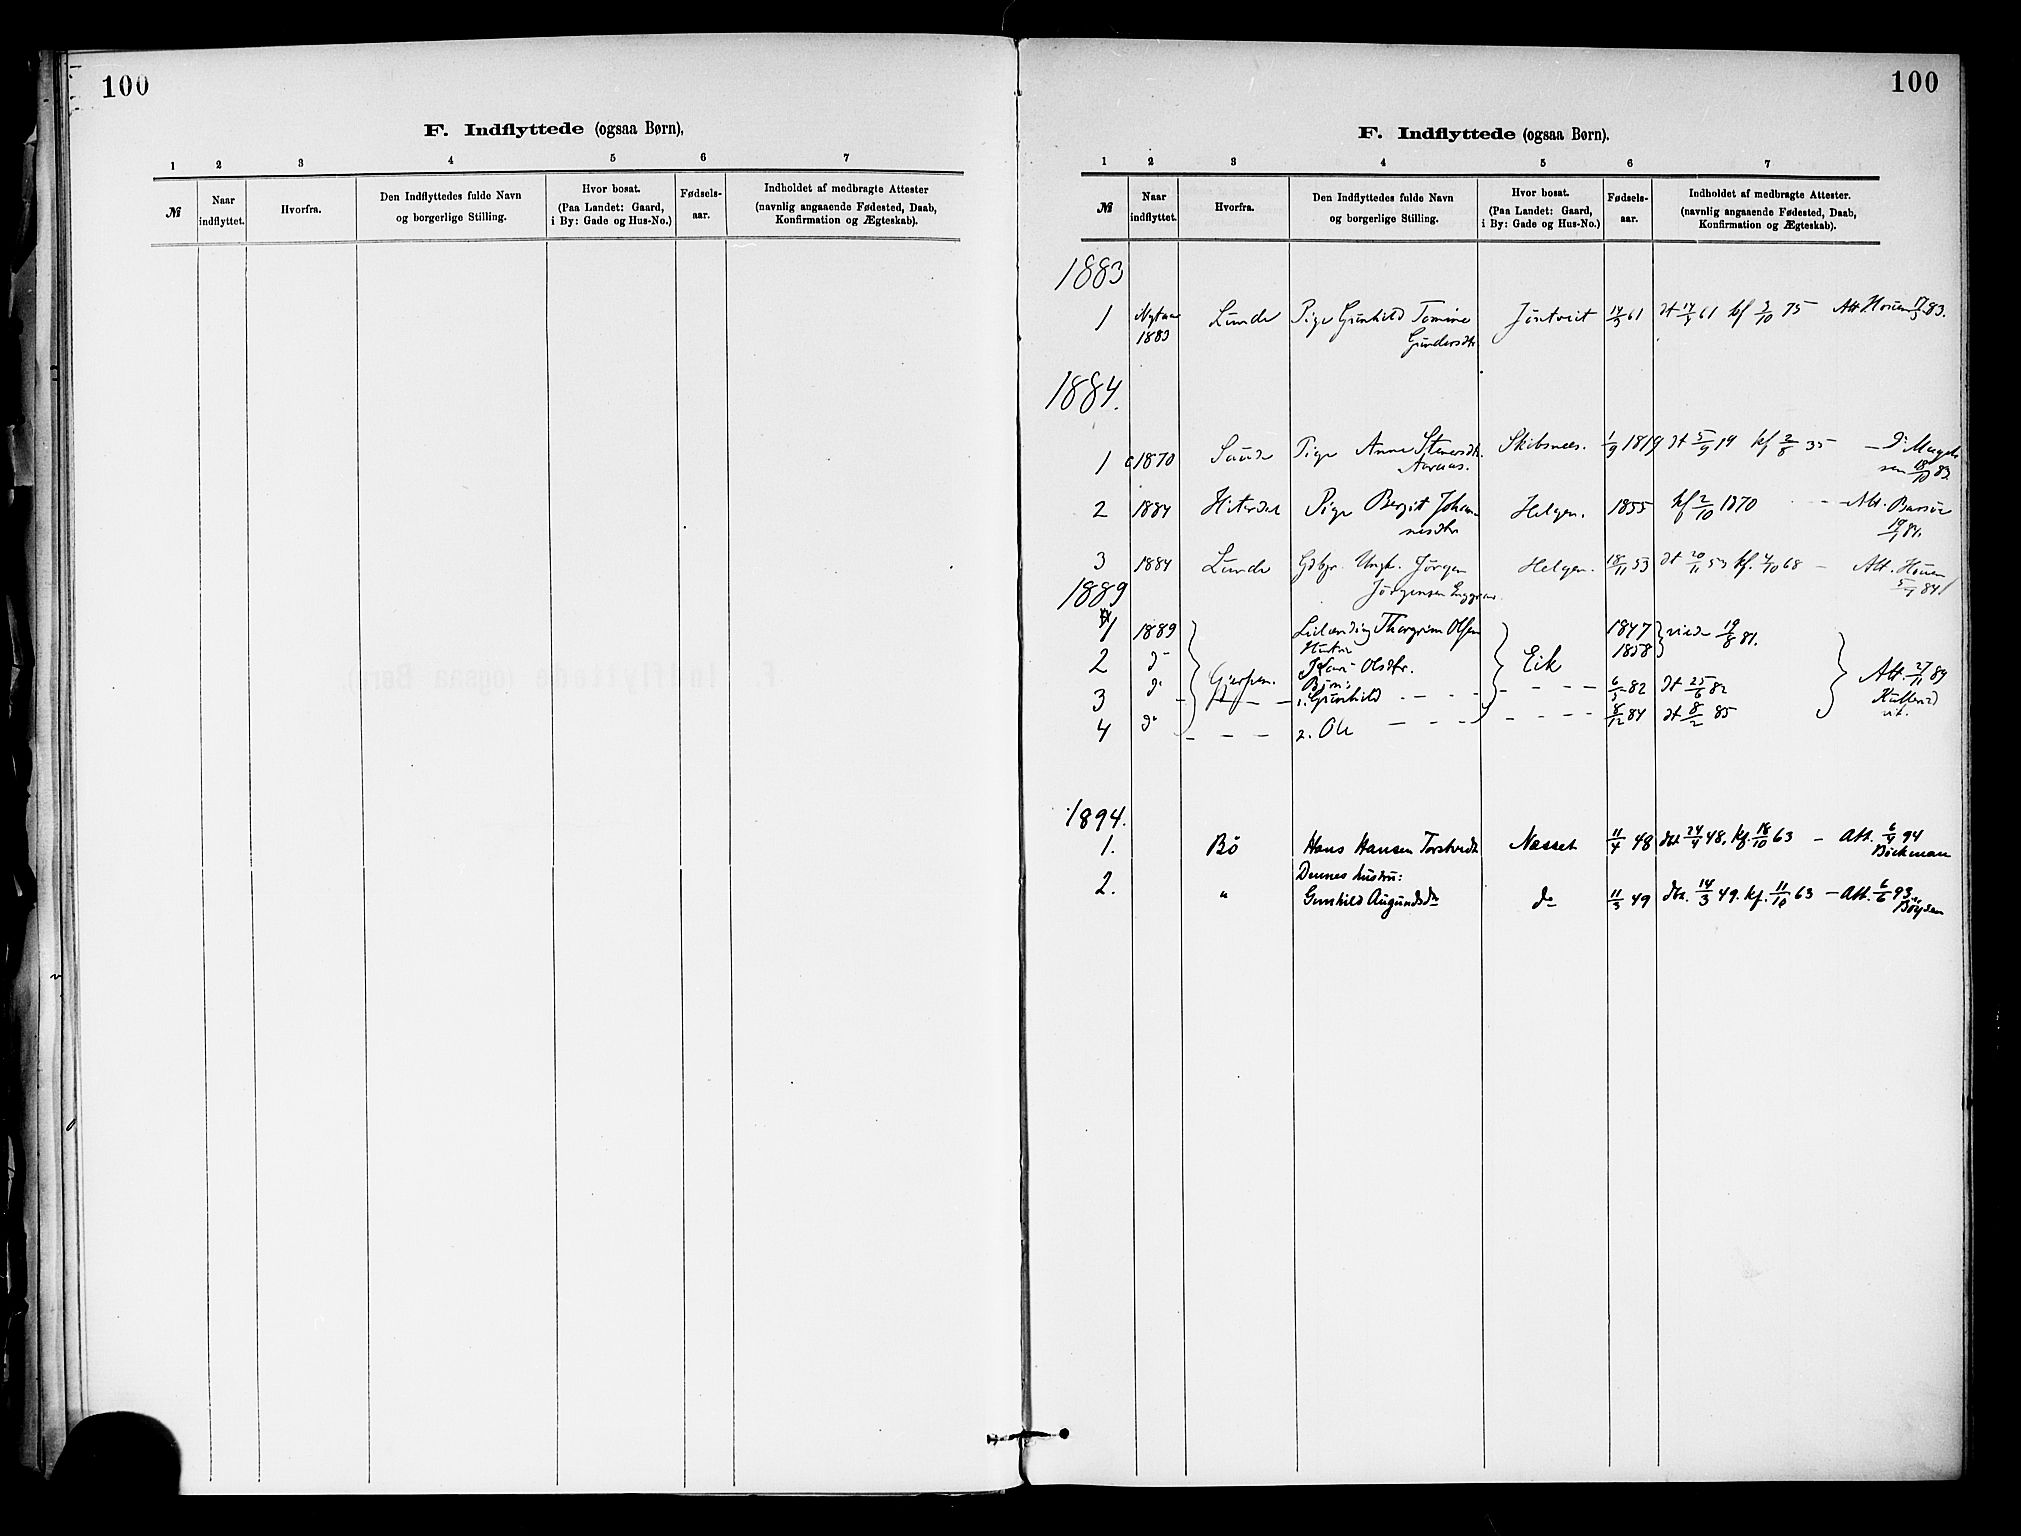 SAKO, Holla kirkebøker, F/Fa/L0009: Ministerialbok nr. 9, 1881-1897, s. 100